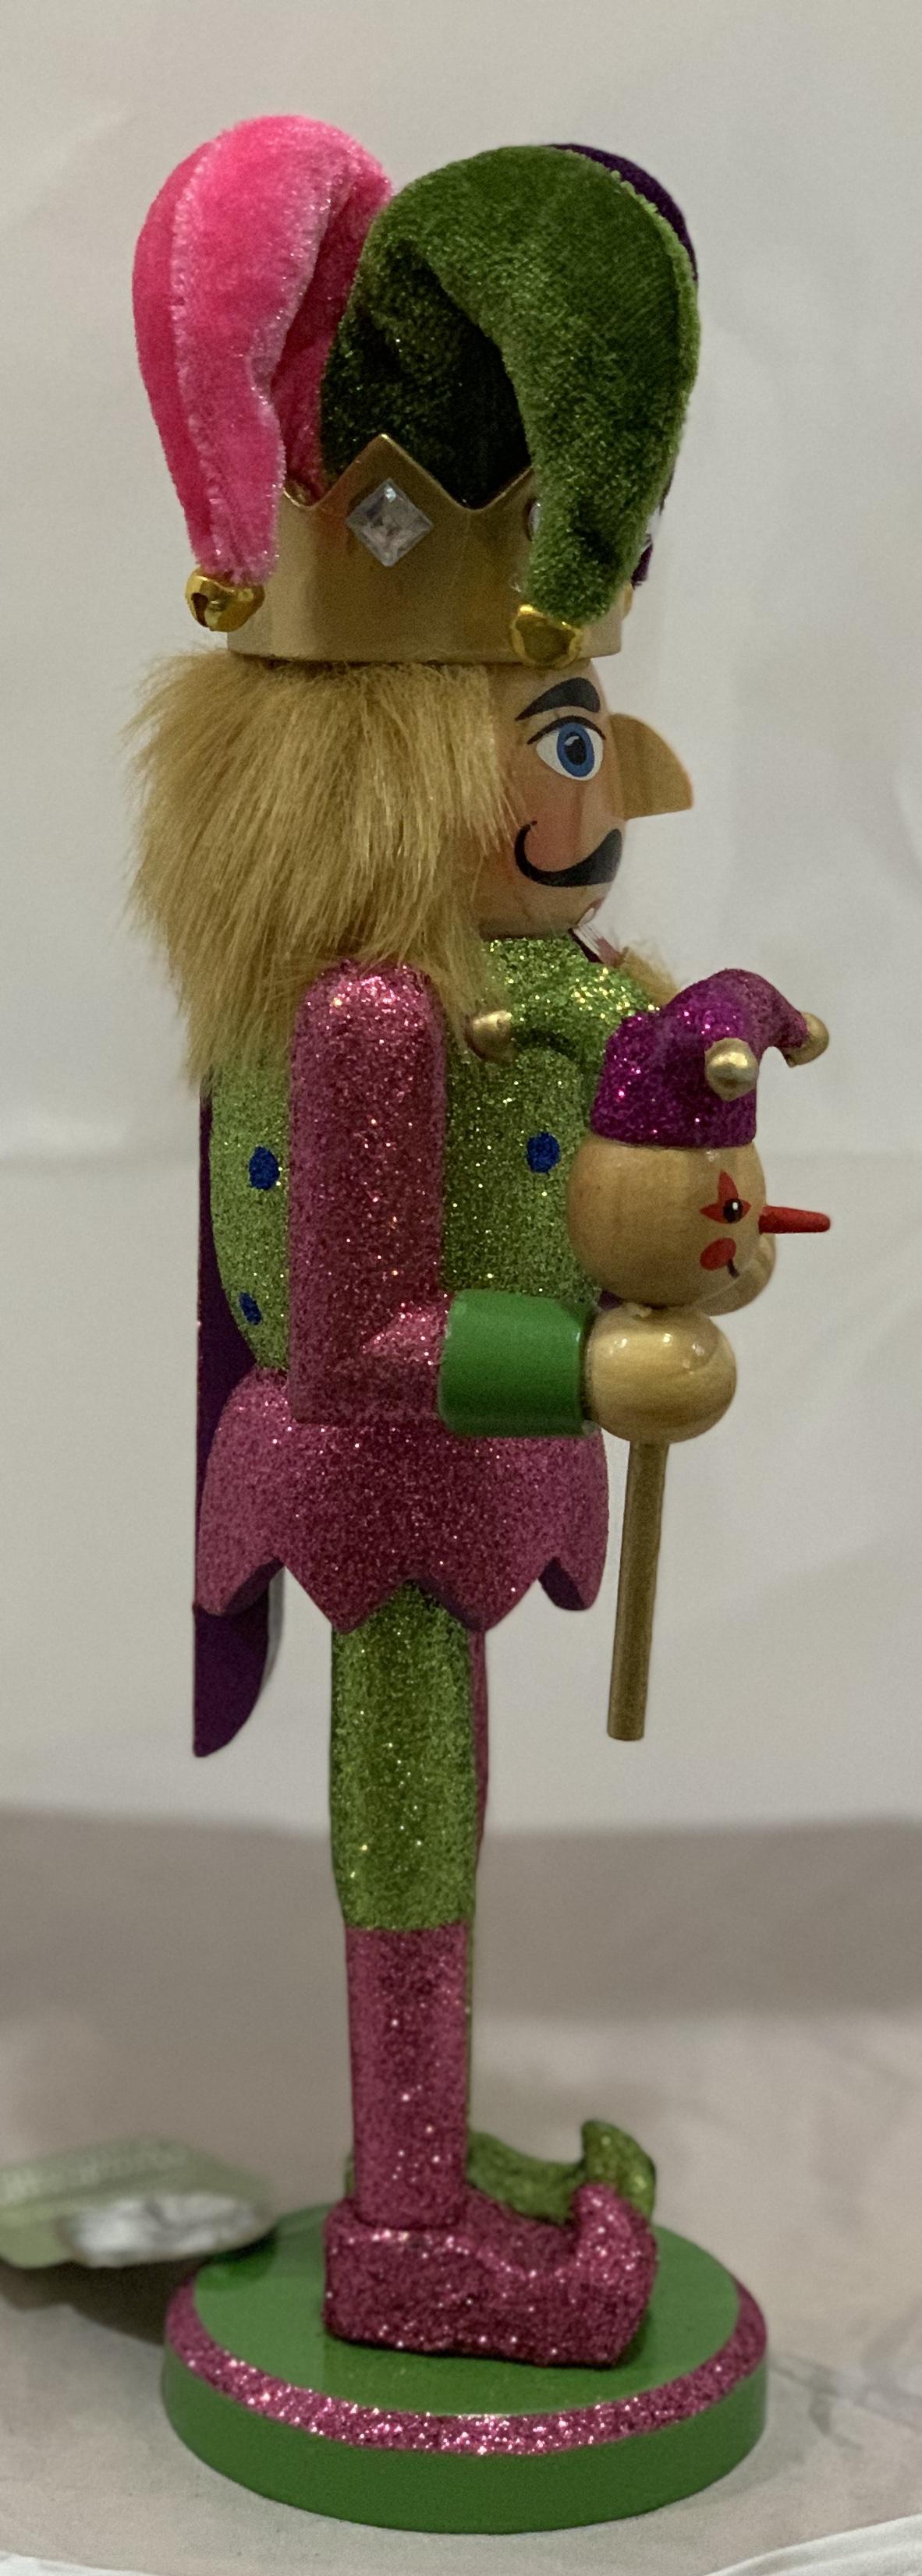 Santas Workshop Jester Nutcracker 12